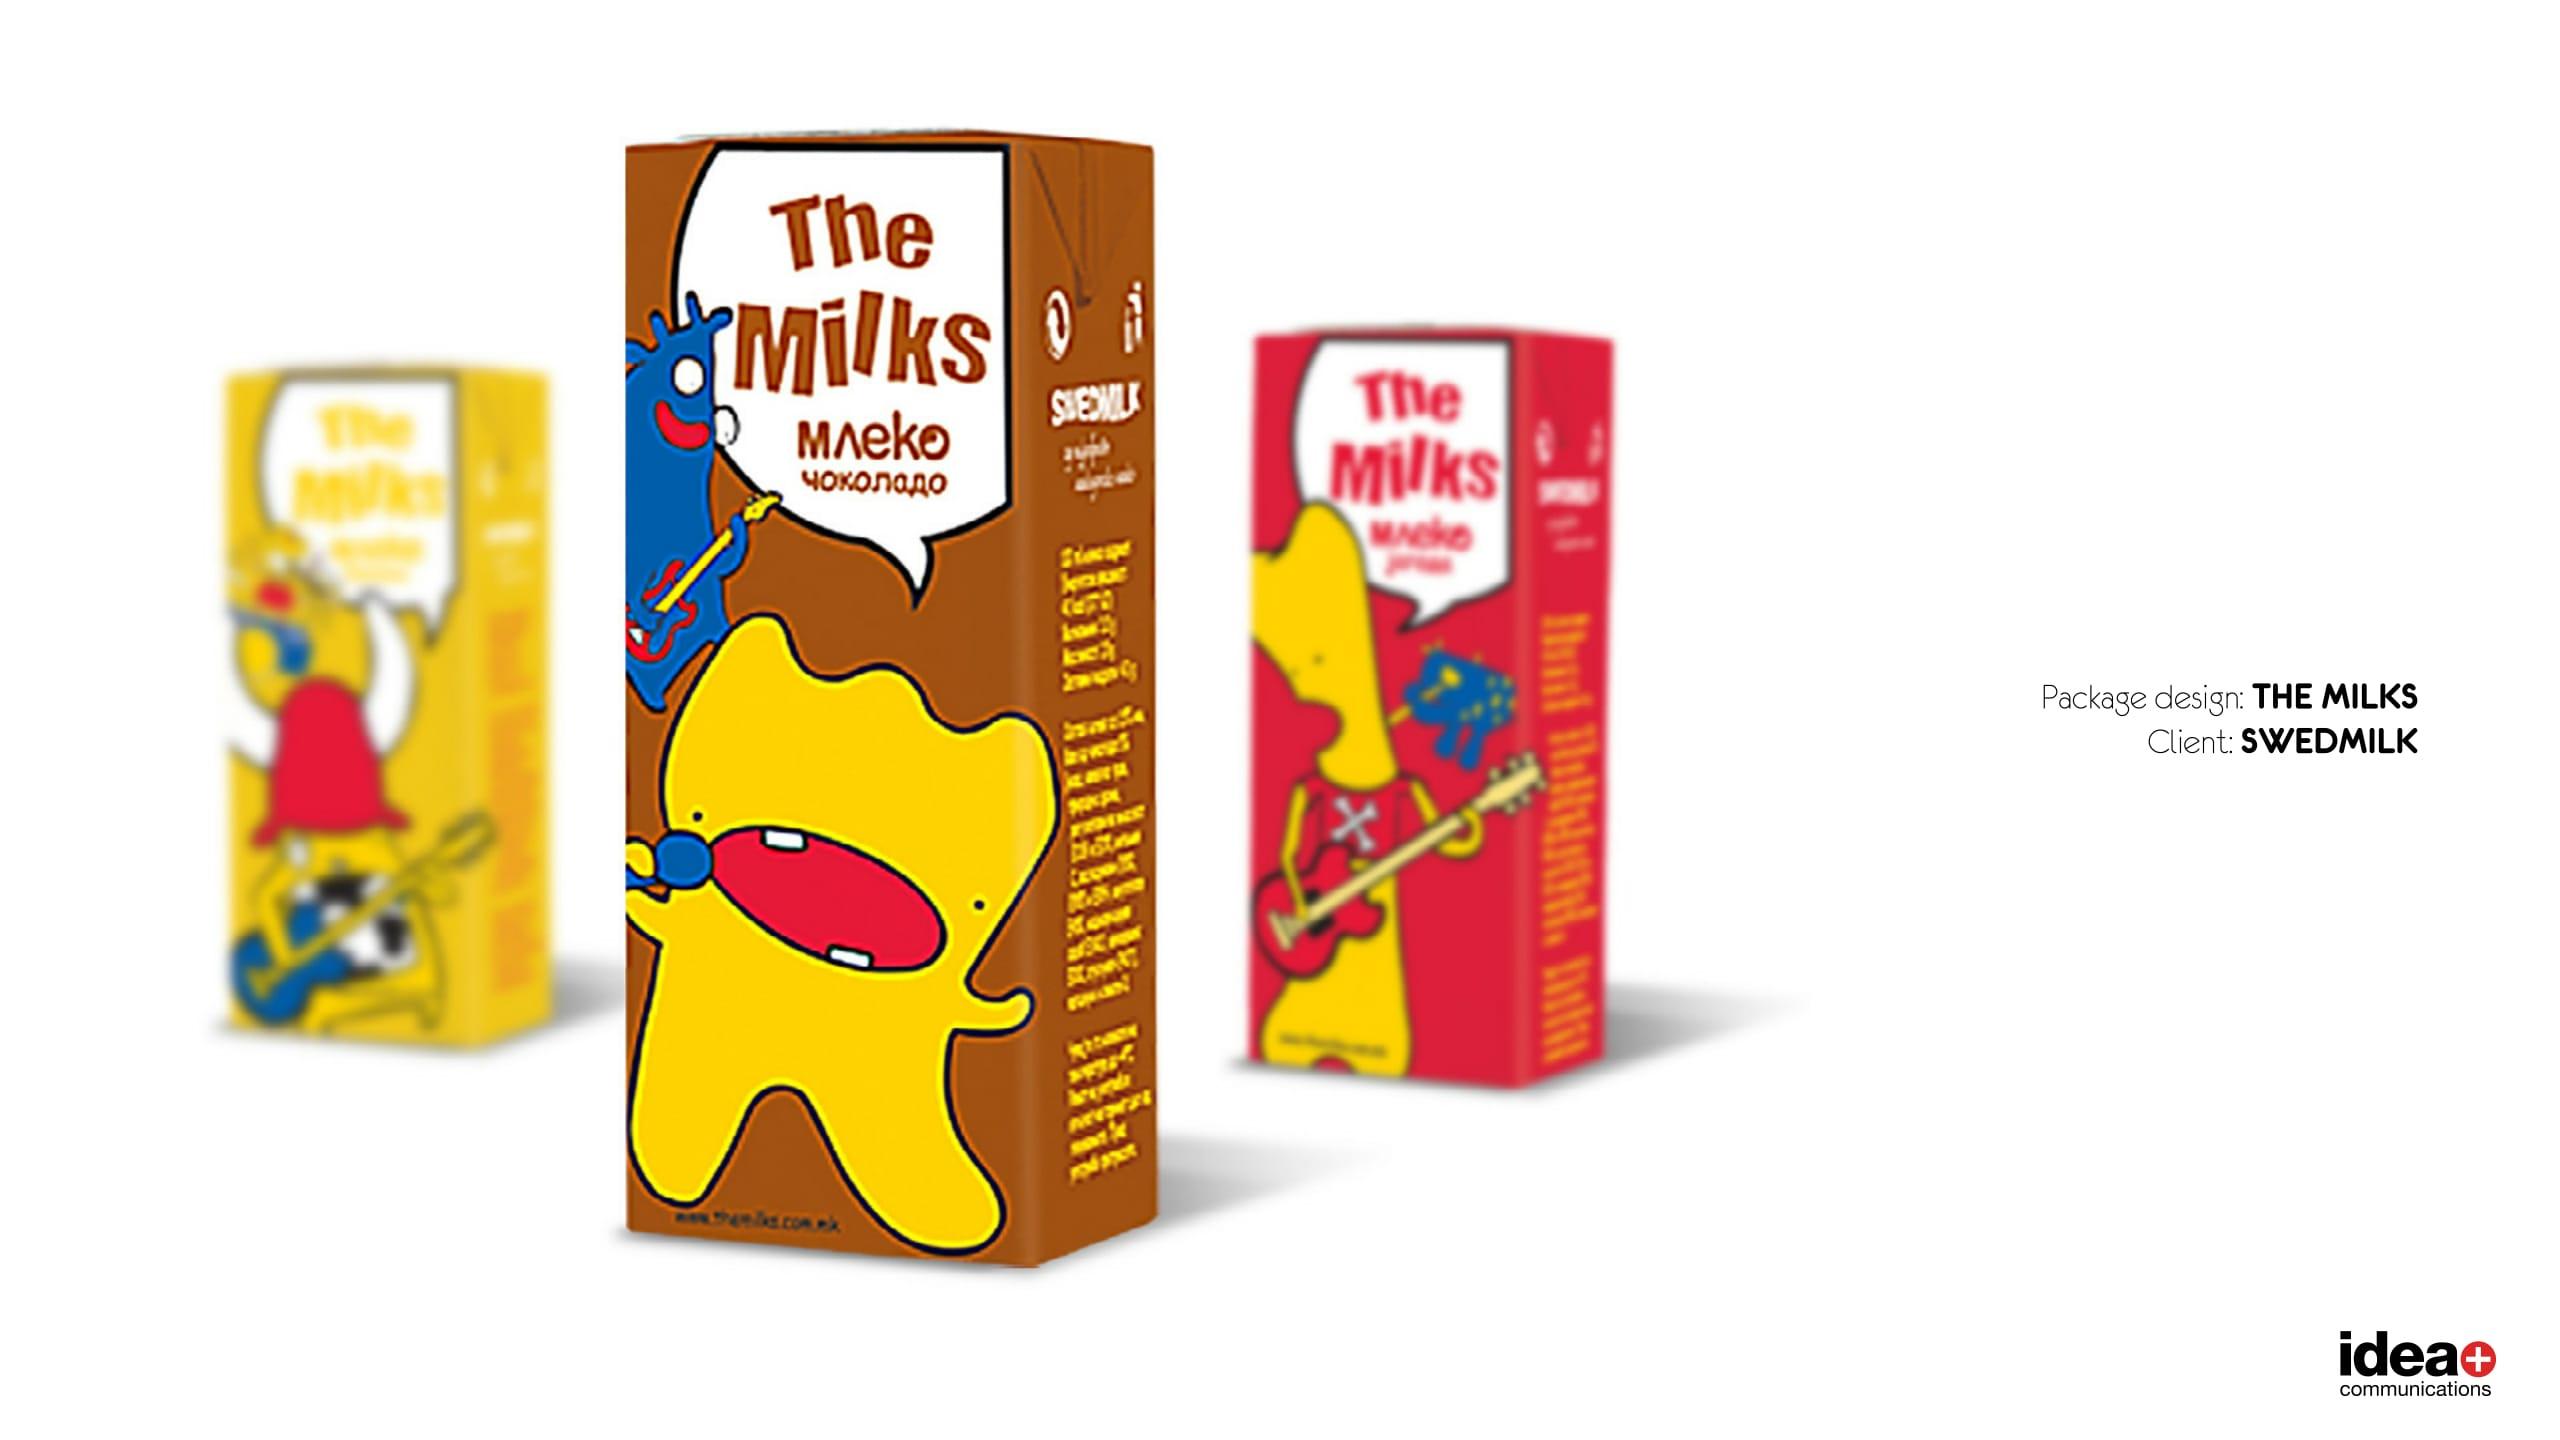 THE MILKS